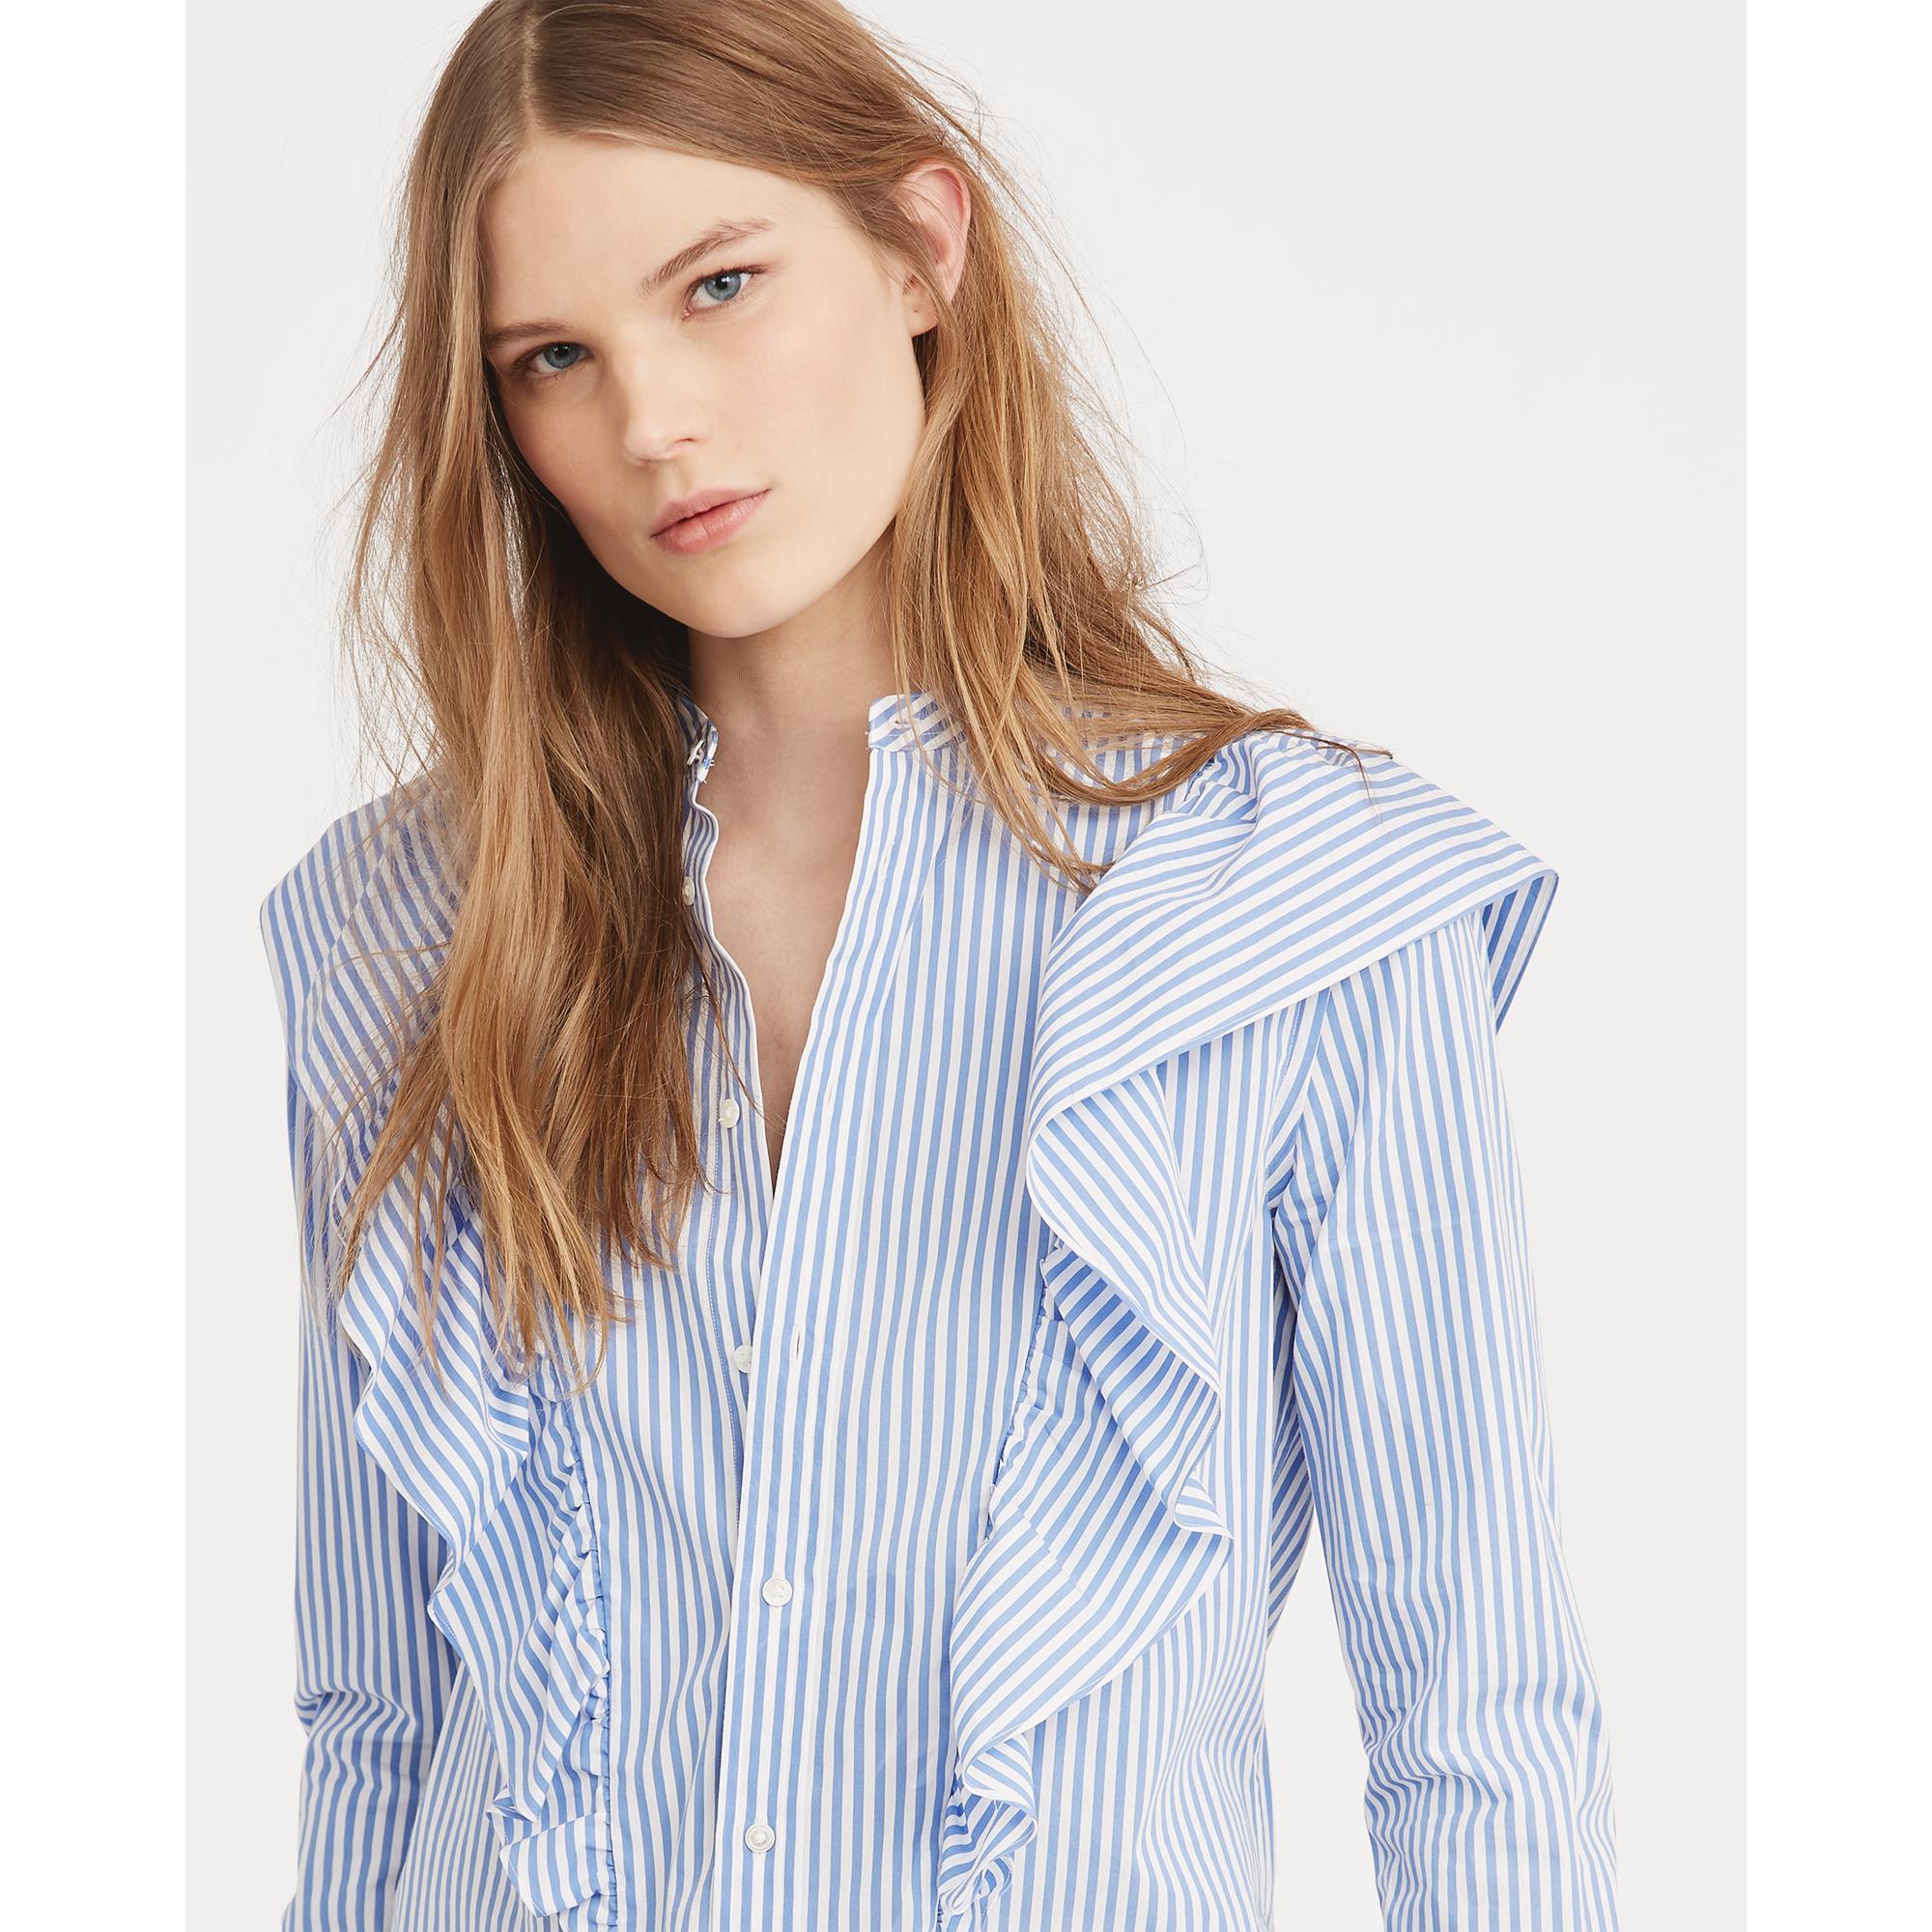 d9255cd0476657 Lyst - Polo Ralph Lauren Striped Ruffled Button-down in Blue